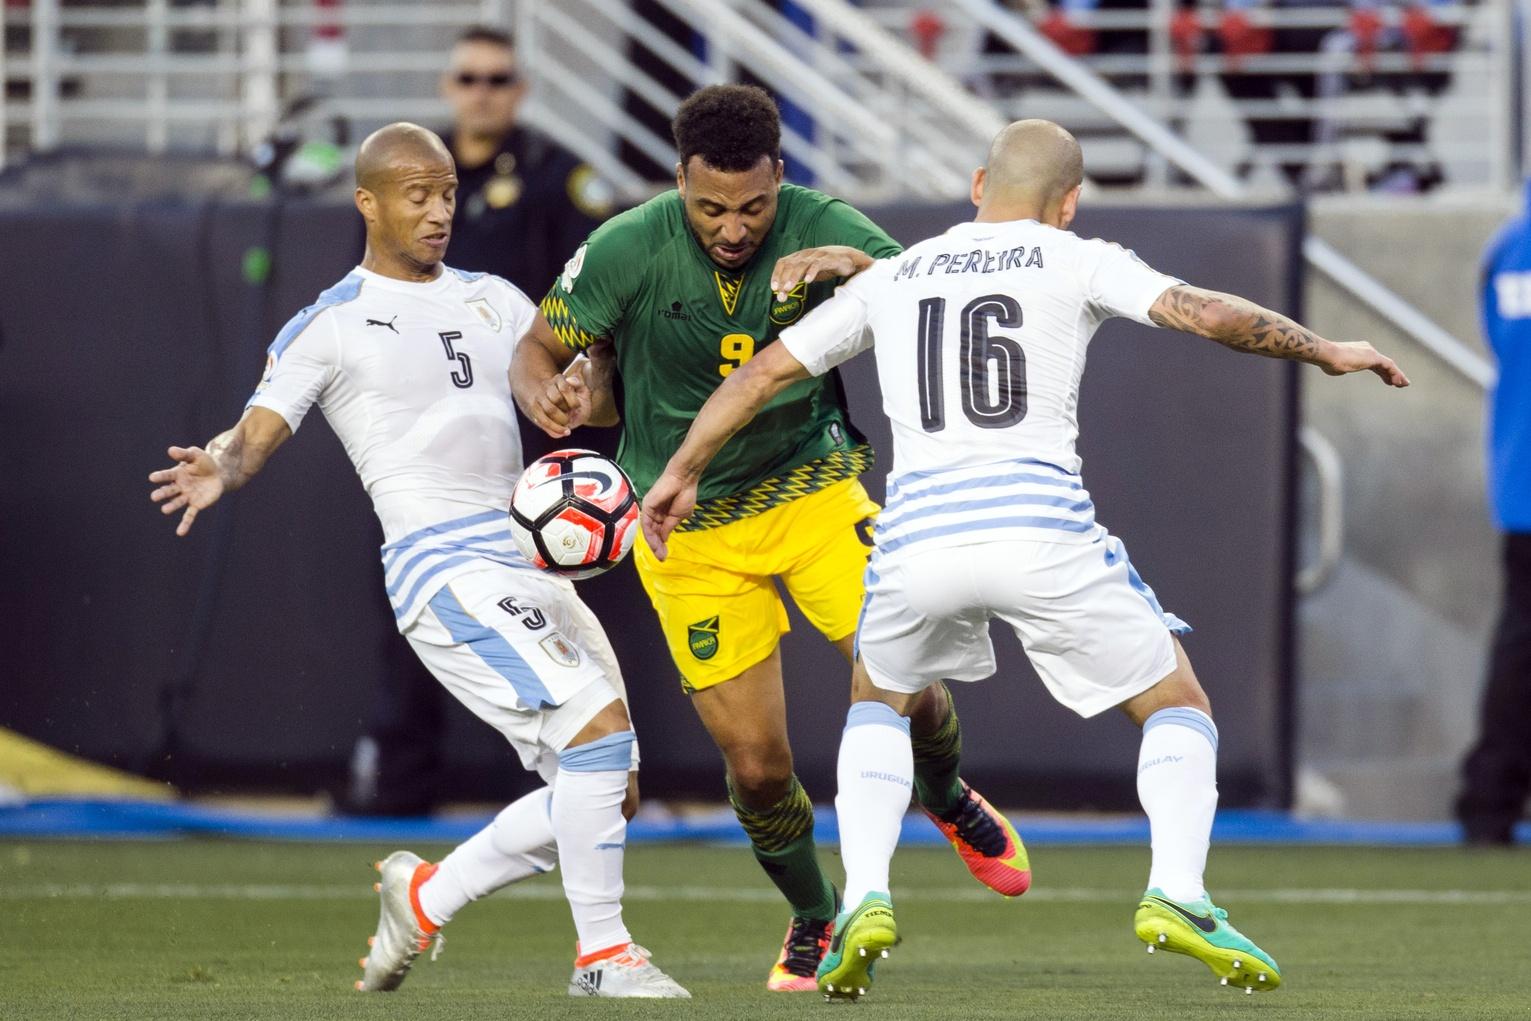 Photo by John Hefti/USA Today Sports